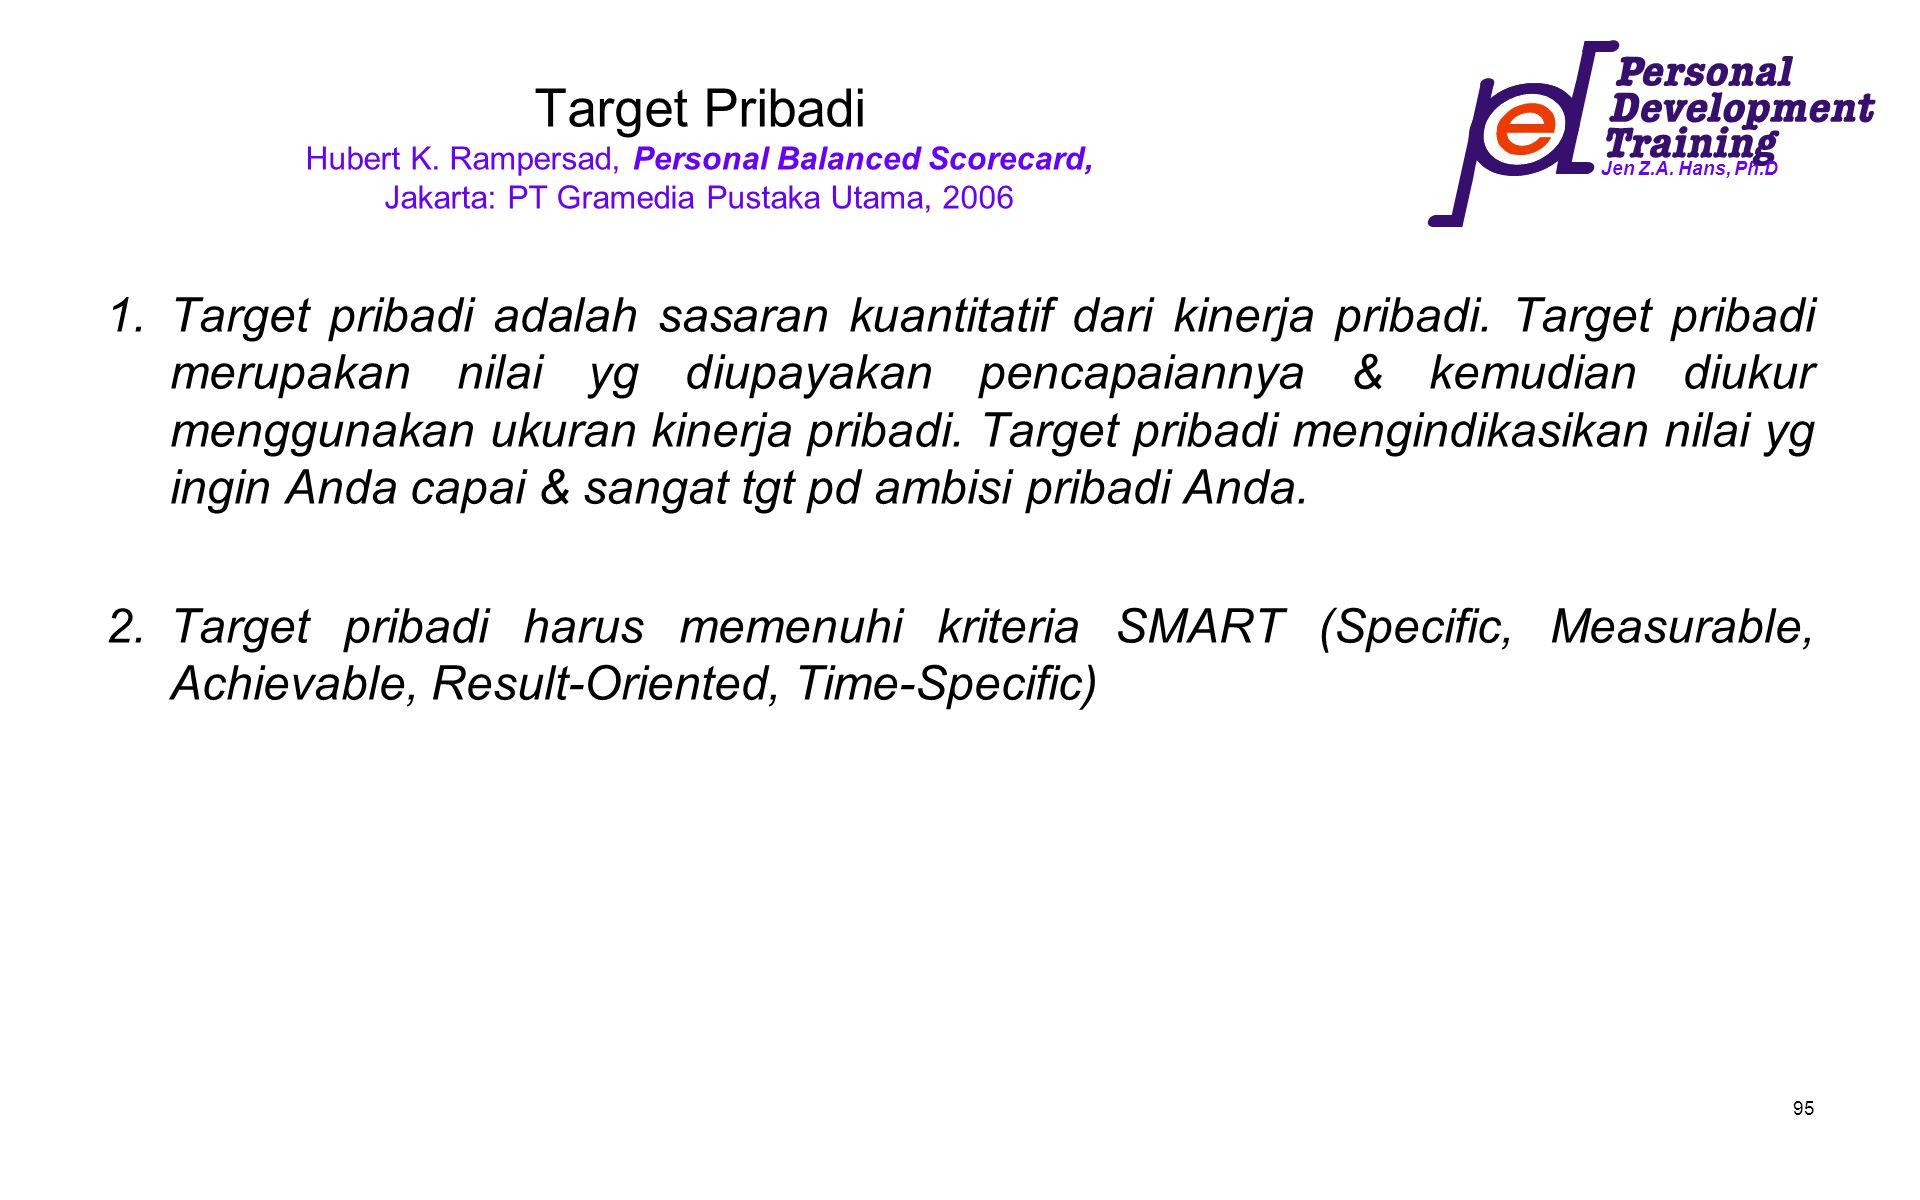 Jen Z.A. Hans, Ph.D 95 Target Pribadi Hubert K. Rampersad, Personal Balanced Scorecard, Jakarta: PT Gramedia Pustaka Utama, 2006 1.Target pribadi adal